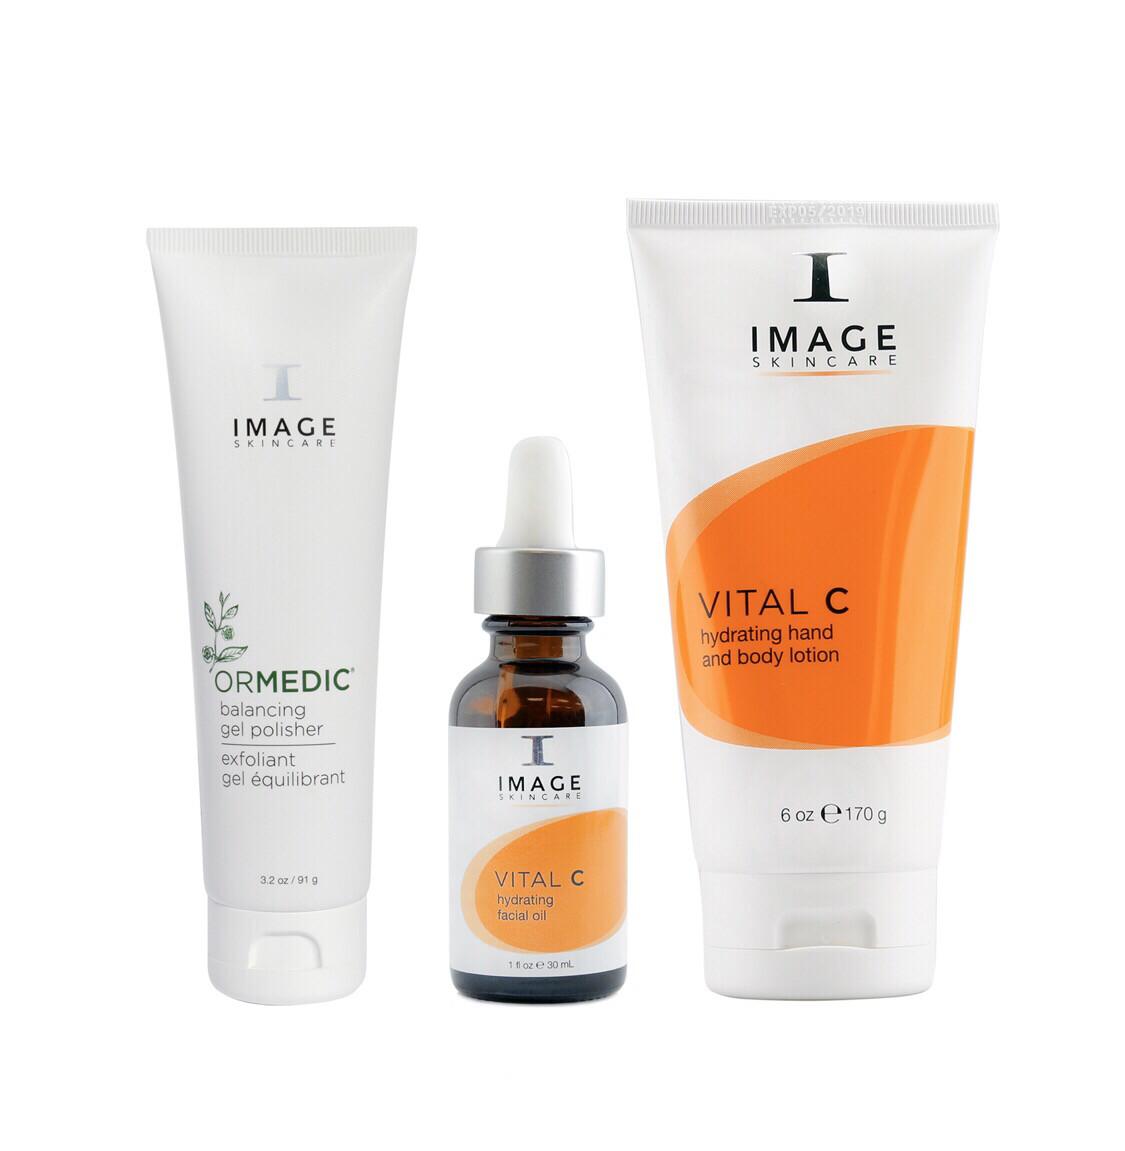 Image Skincare Hand Hydration Facial